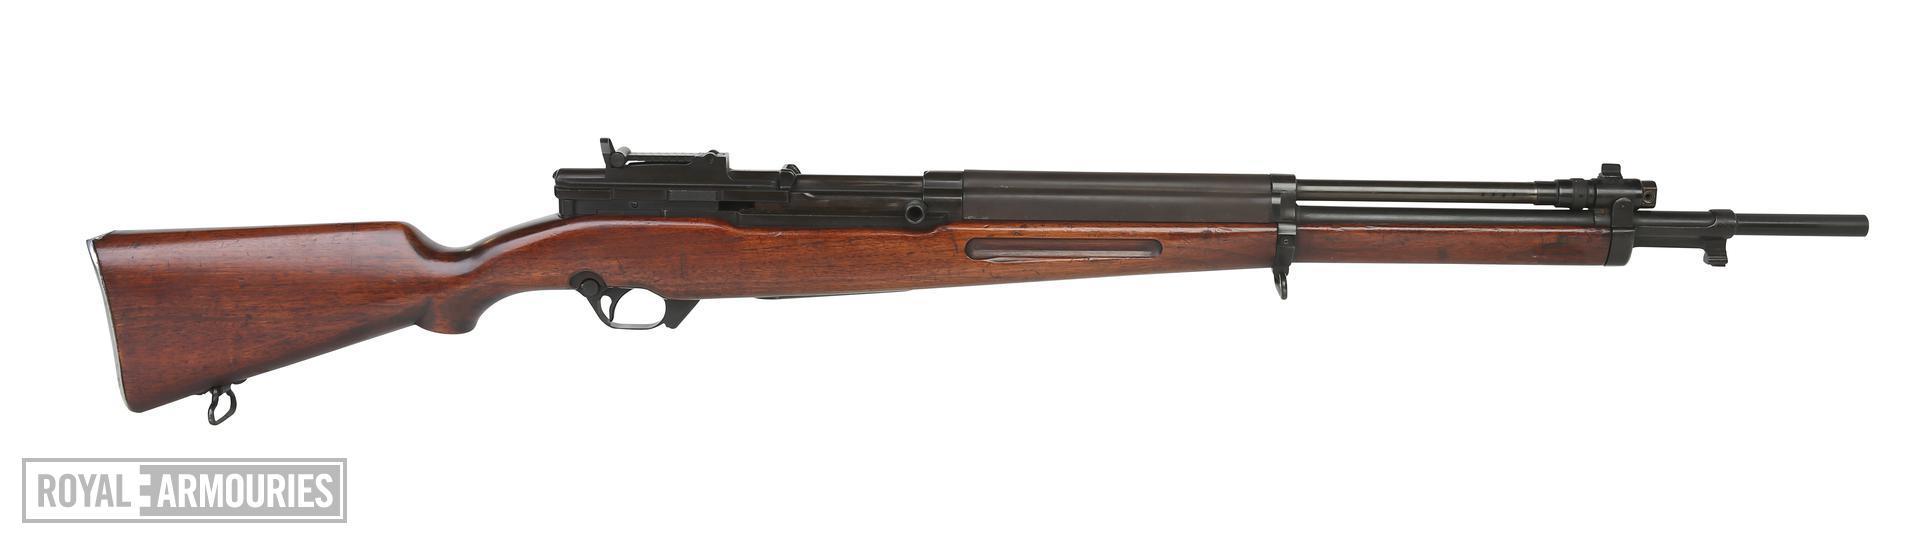 Experimental Saive SLEM-1. Centrefire self-loading rifle. PR.6621